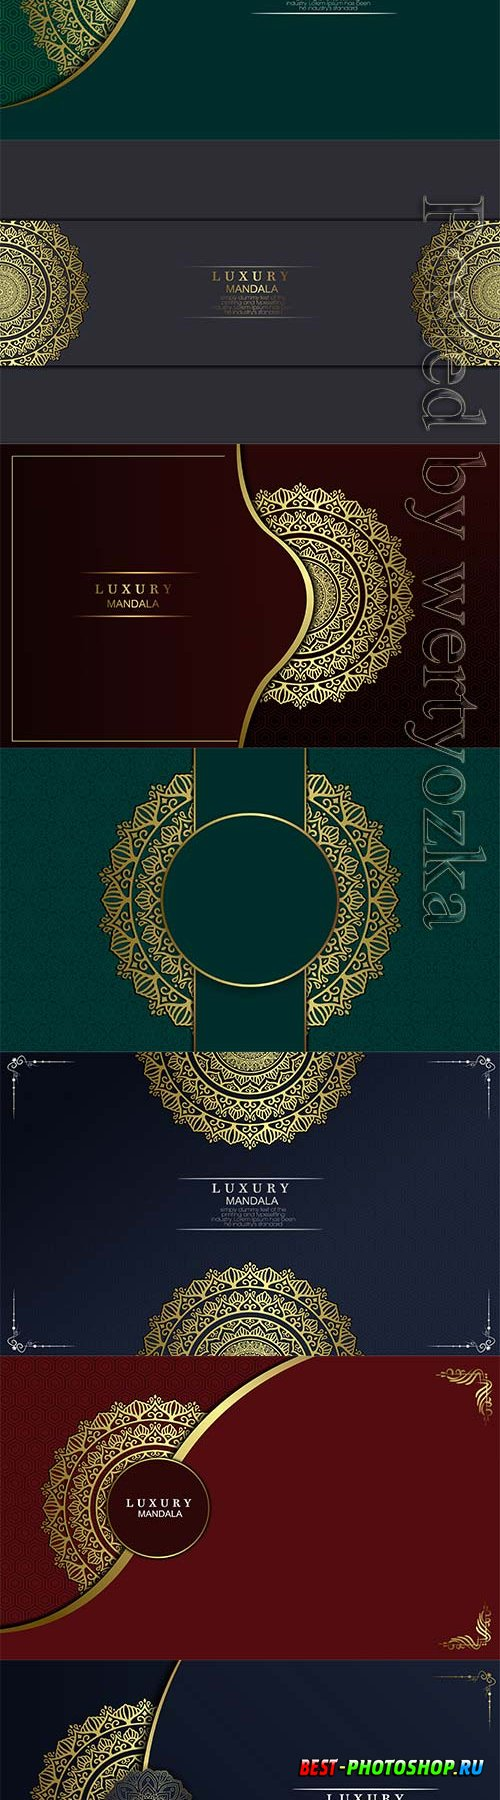 Floral and mandala ornamental decorative frame